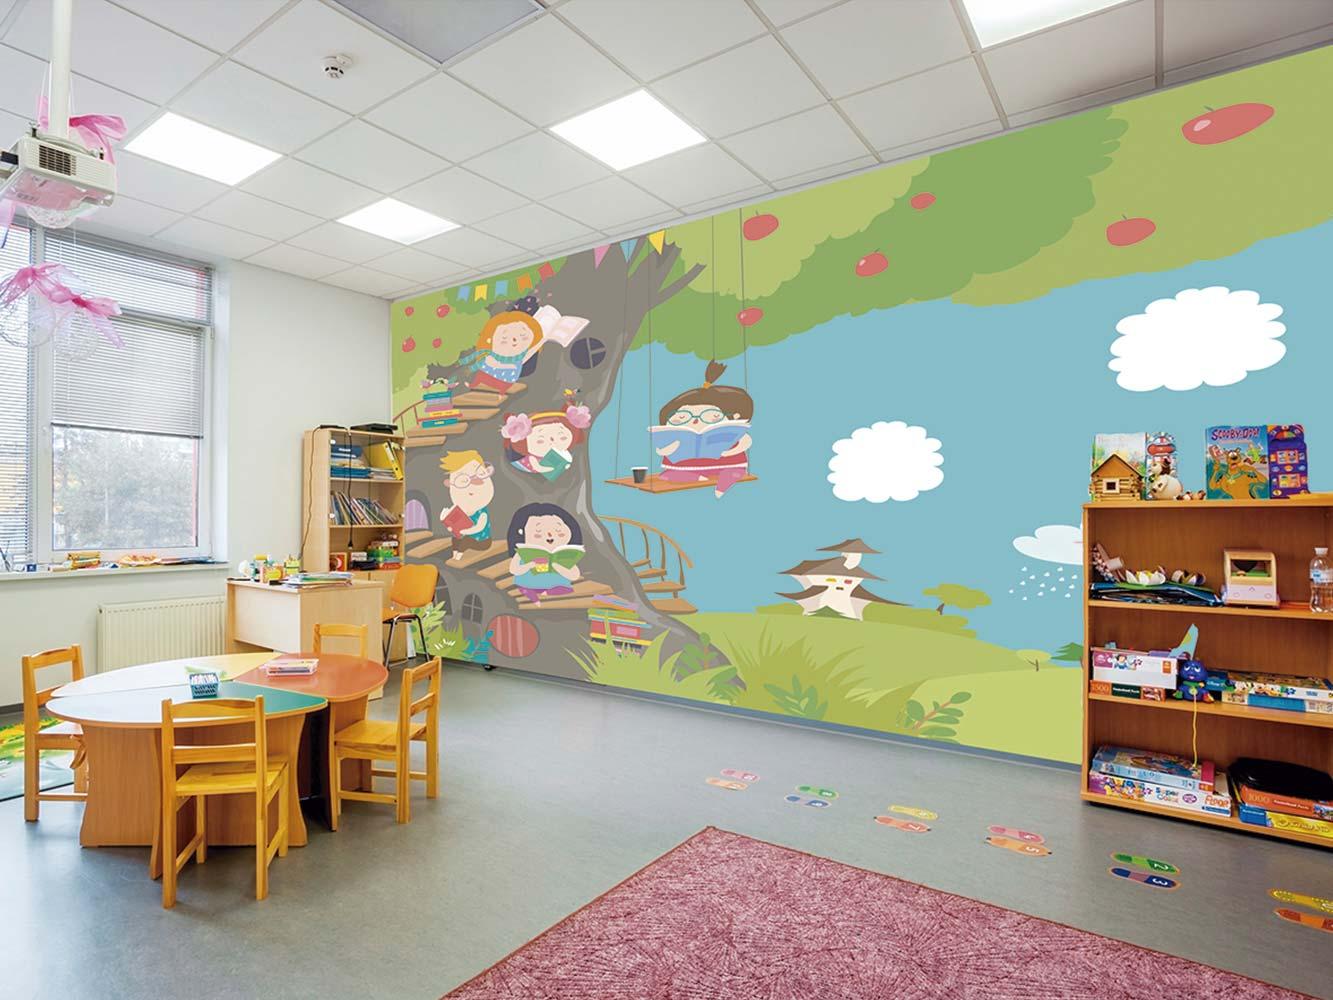 Fotomural Vinilo Infantil Bosque de la Lectura | Carteles XXL - Impresión carteleria publicitaria